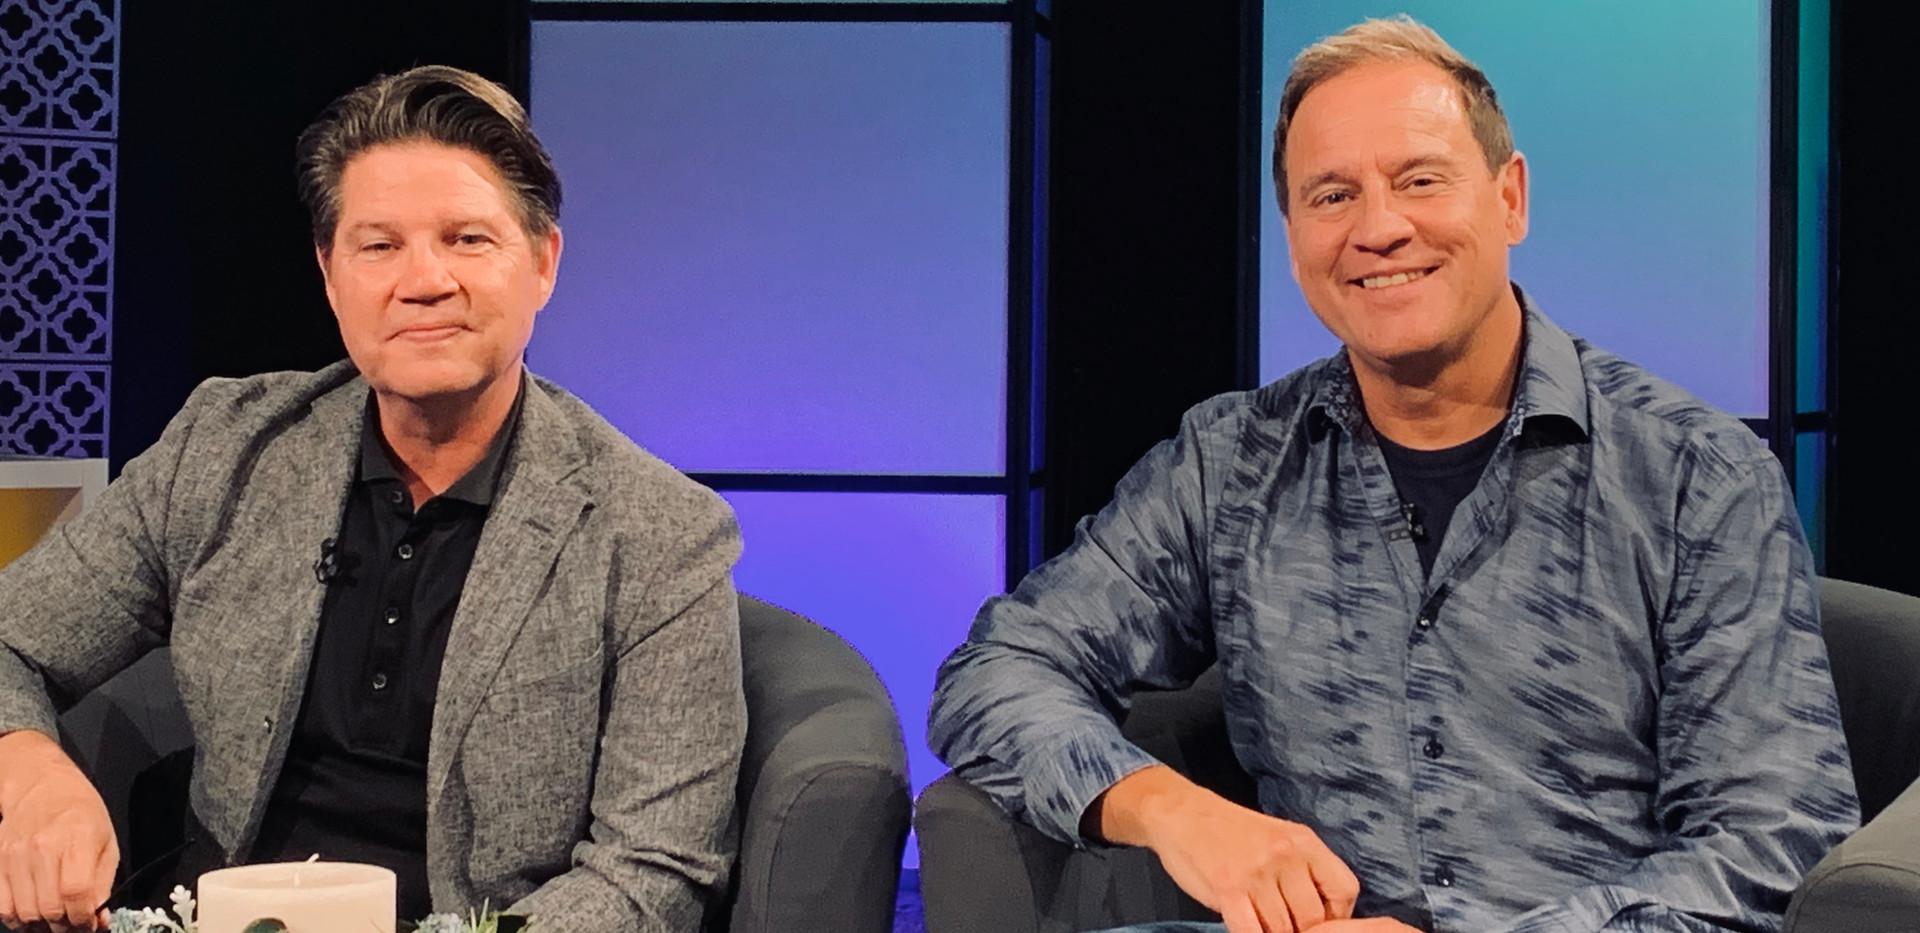 LIFELINE TODAY | Season 6, Episode183 | Marc Brisbrois & Craig Buroker